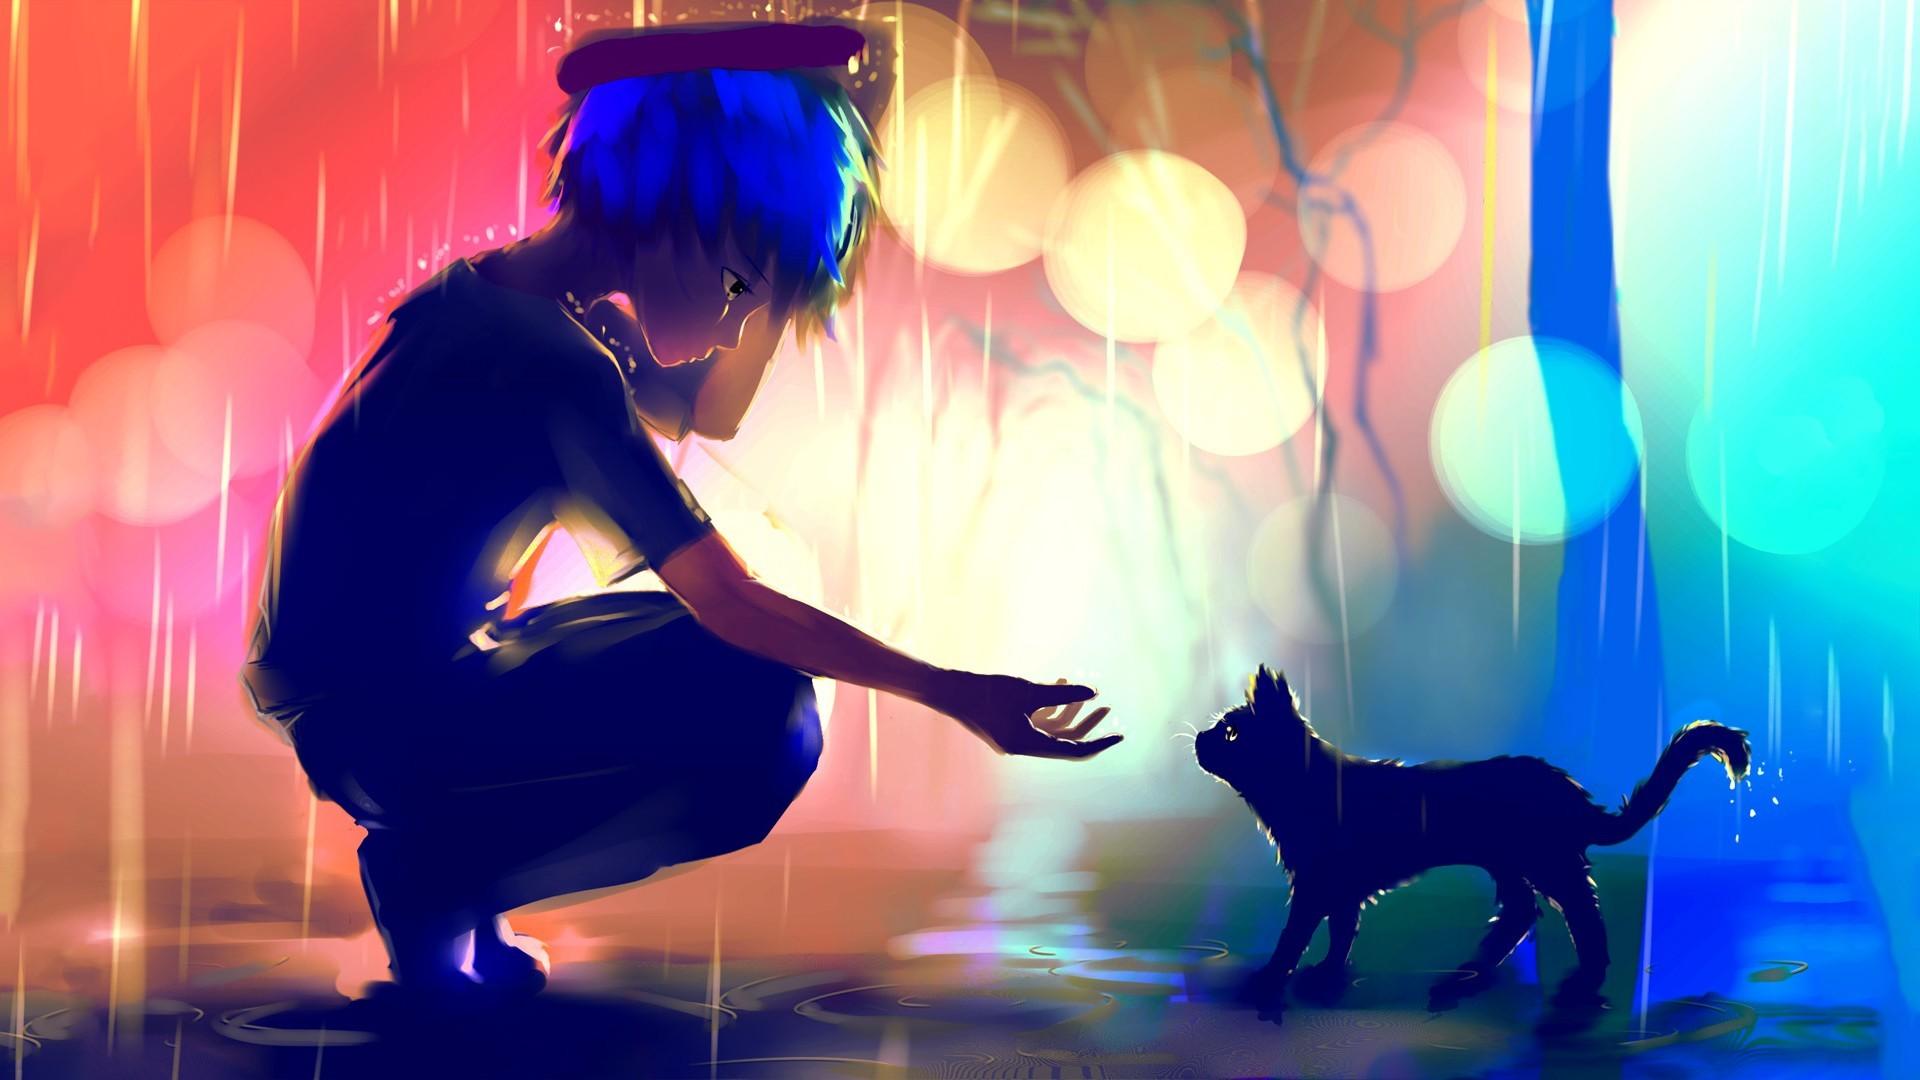 Anime Desktop Wallpaper · Anime HD Background